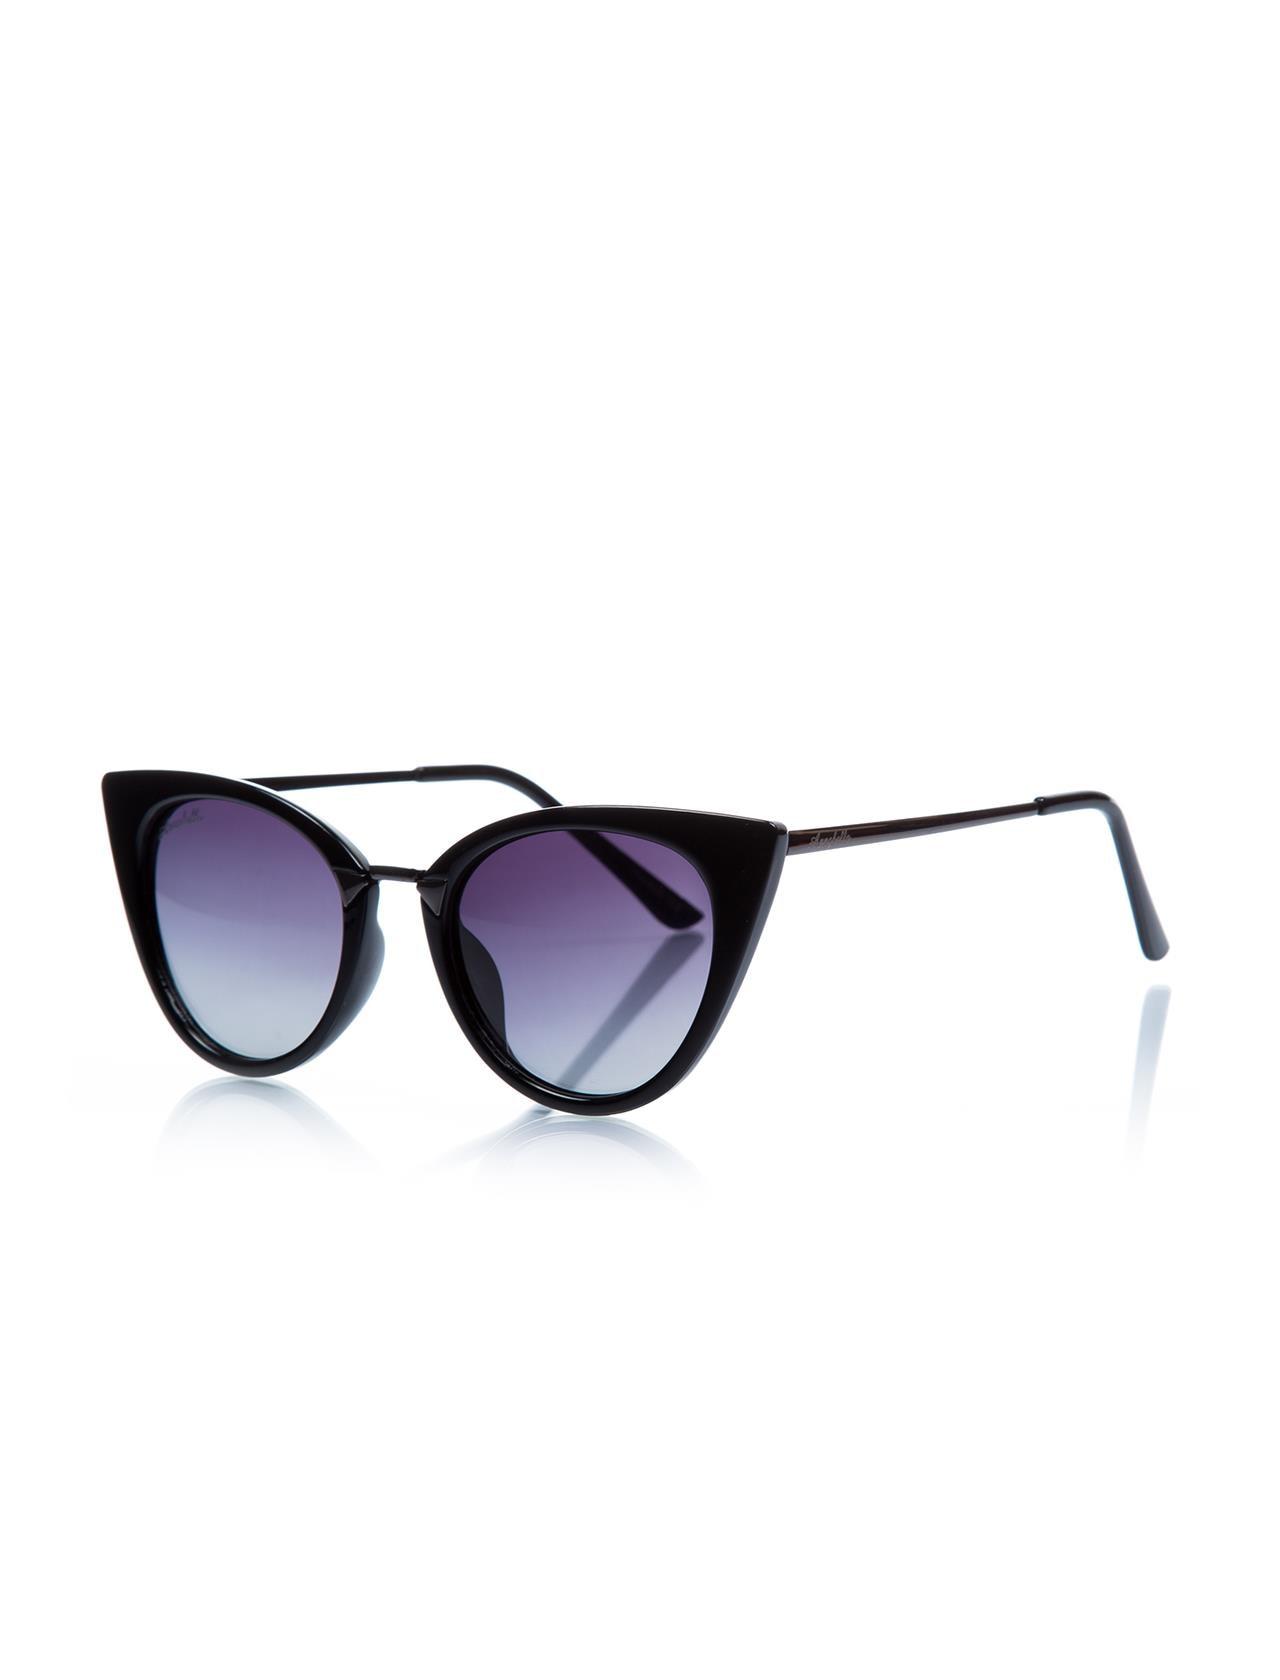 Women's sunglasses anb 221 07 bone black organic butterfly cat eye 51-12-137 annabella